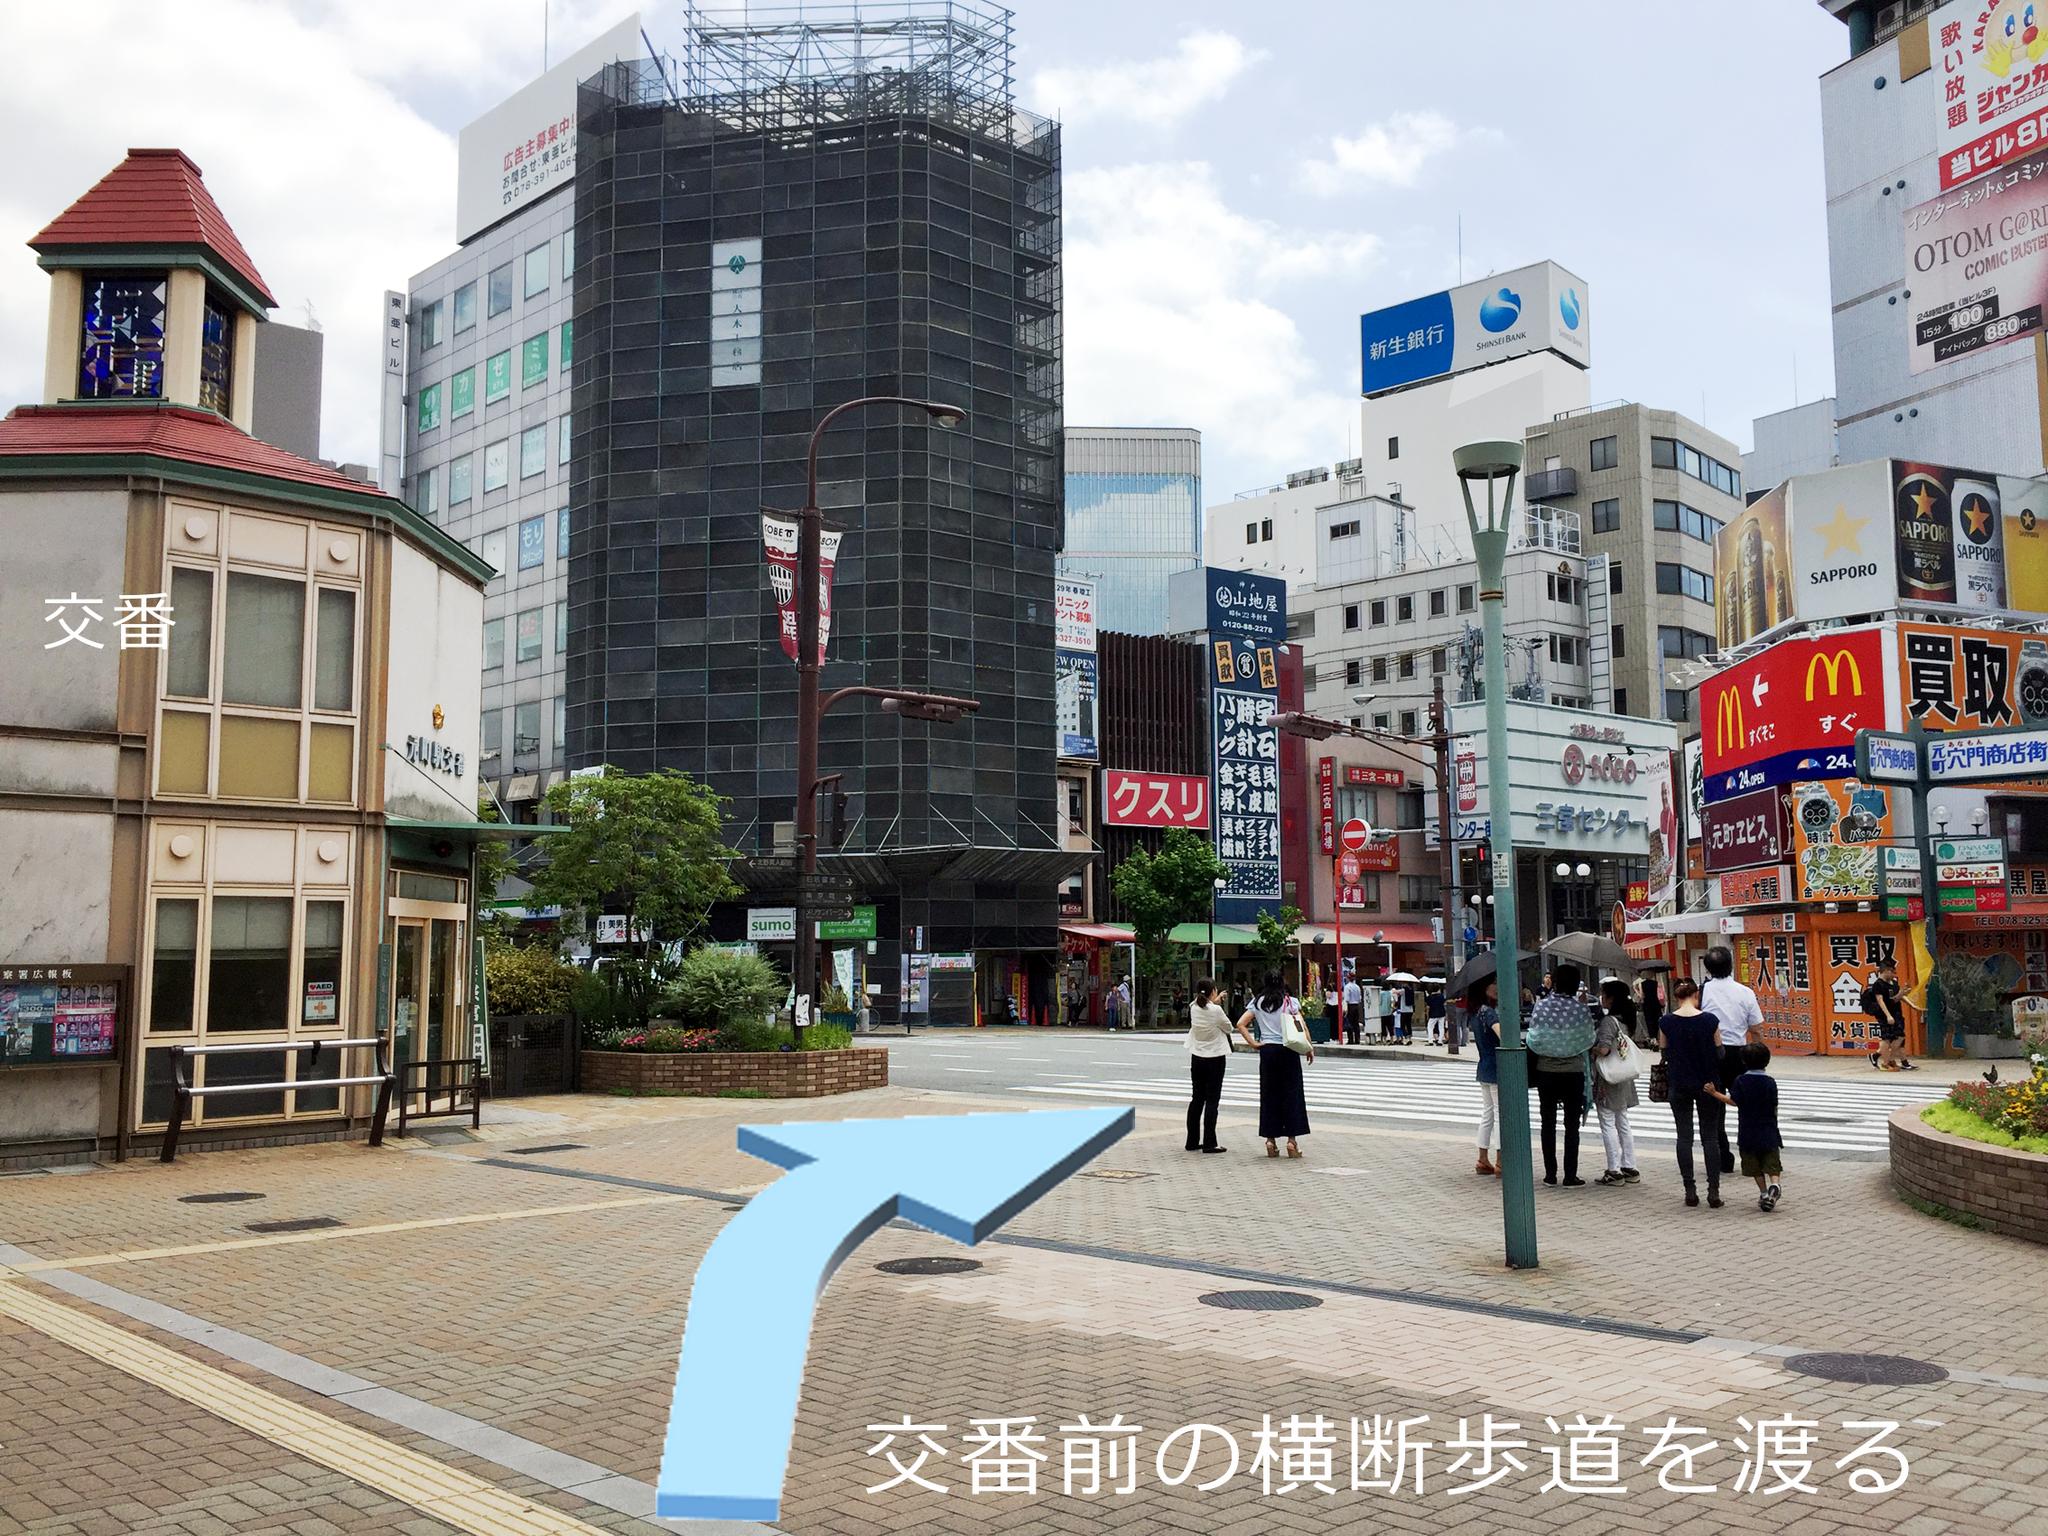 JR元町駅前広場